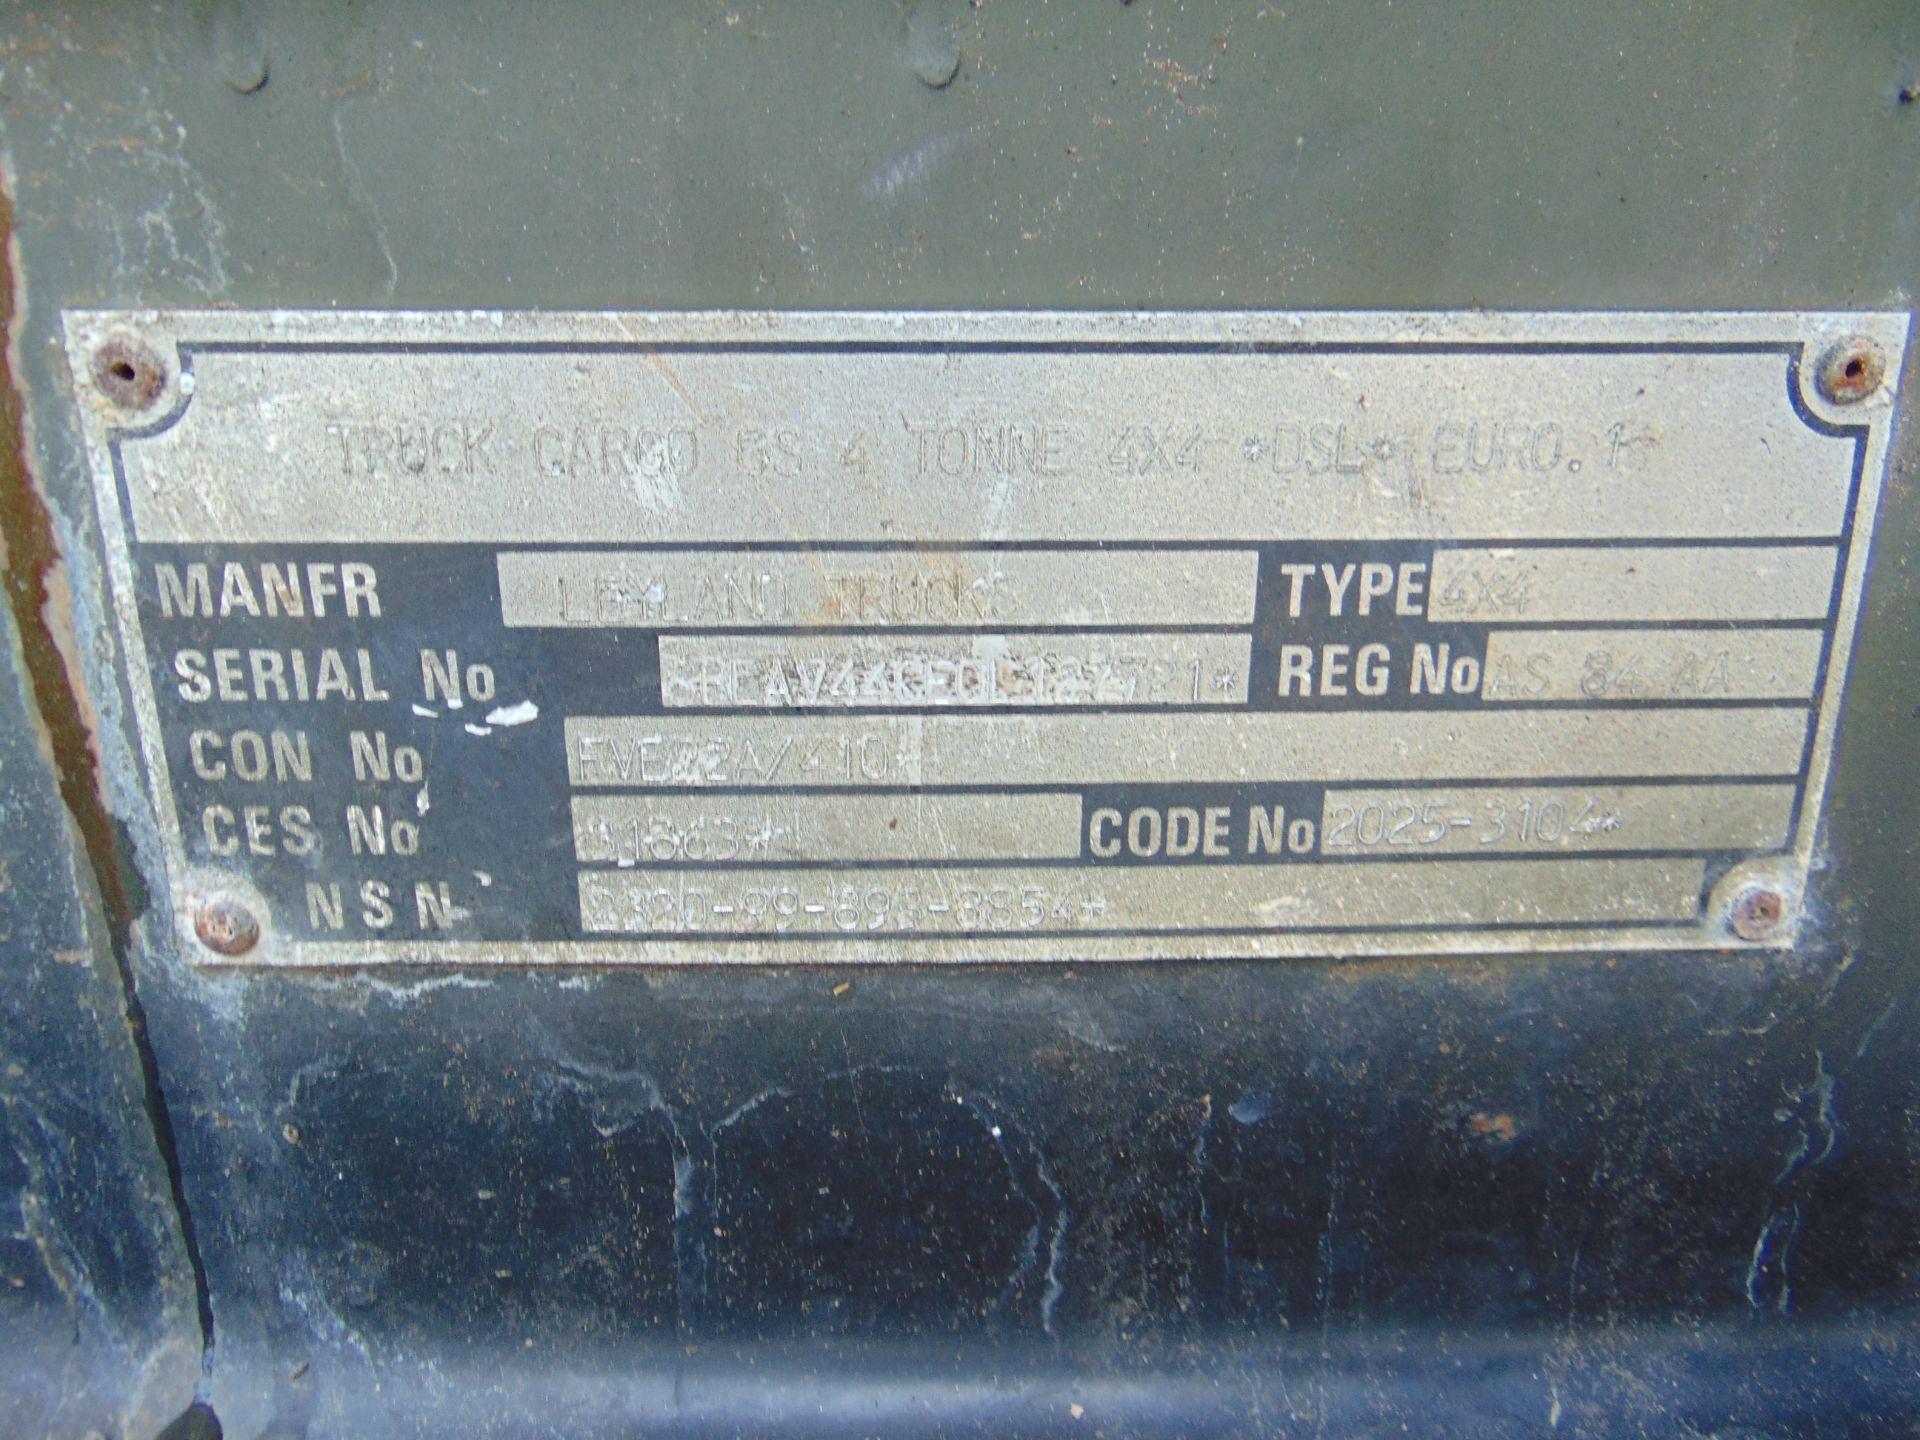 Leyland Daf 45/150 4 x 4 - Image 11 of 22